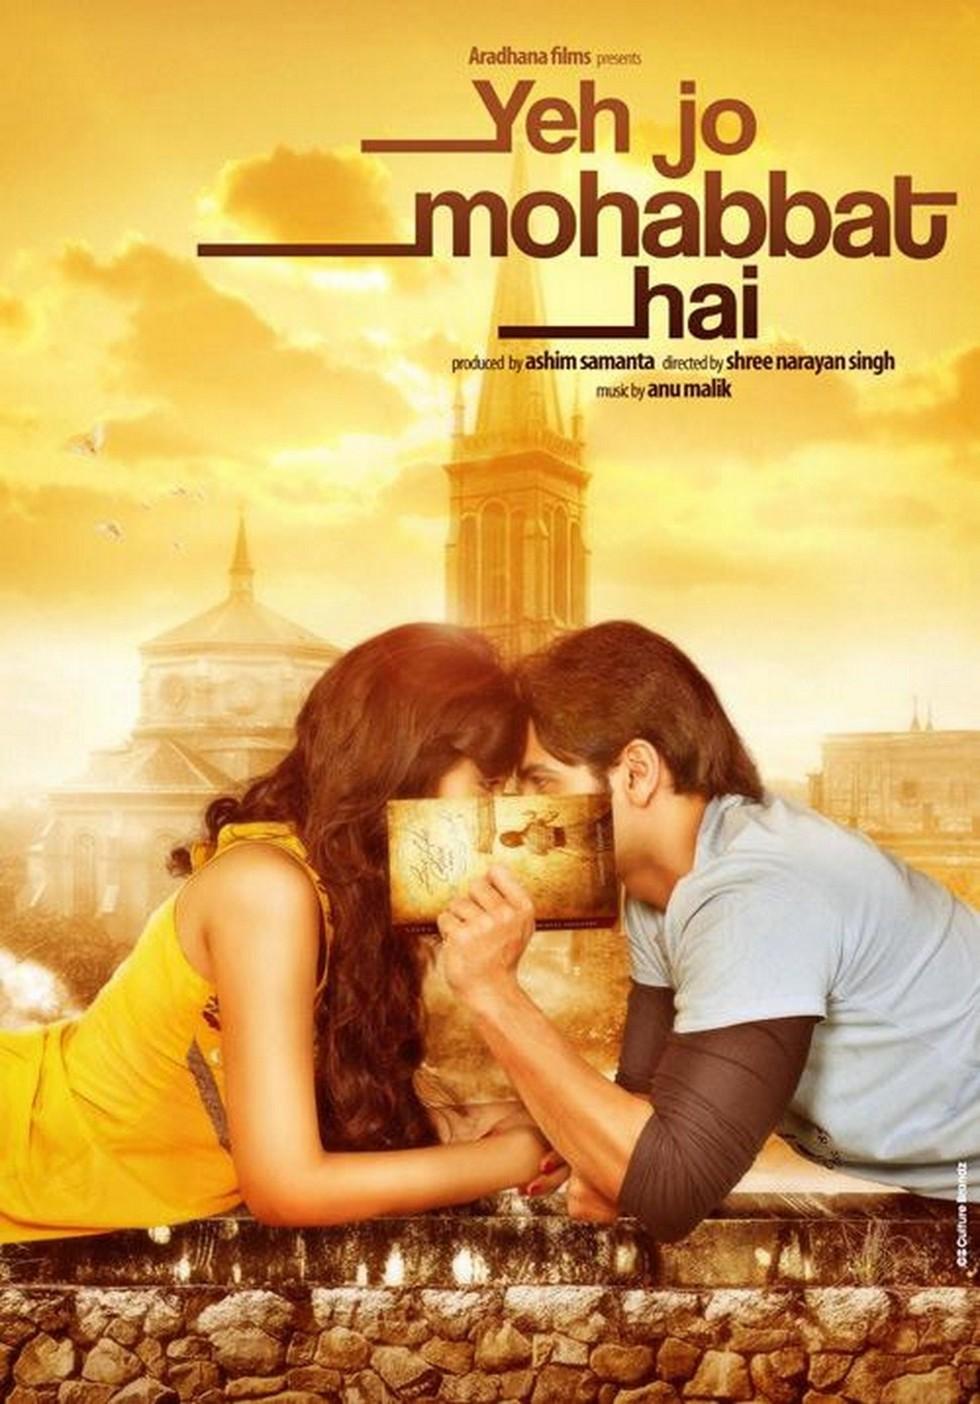 Yeh Jo Mohabbat Hai - Movie Poster #1 (Large)